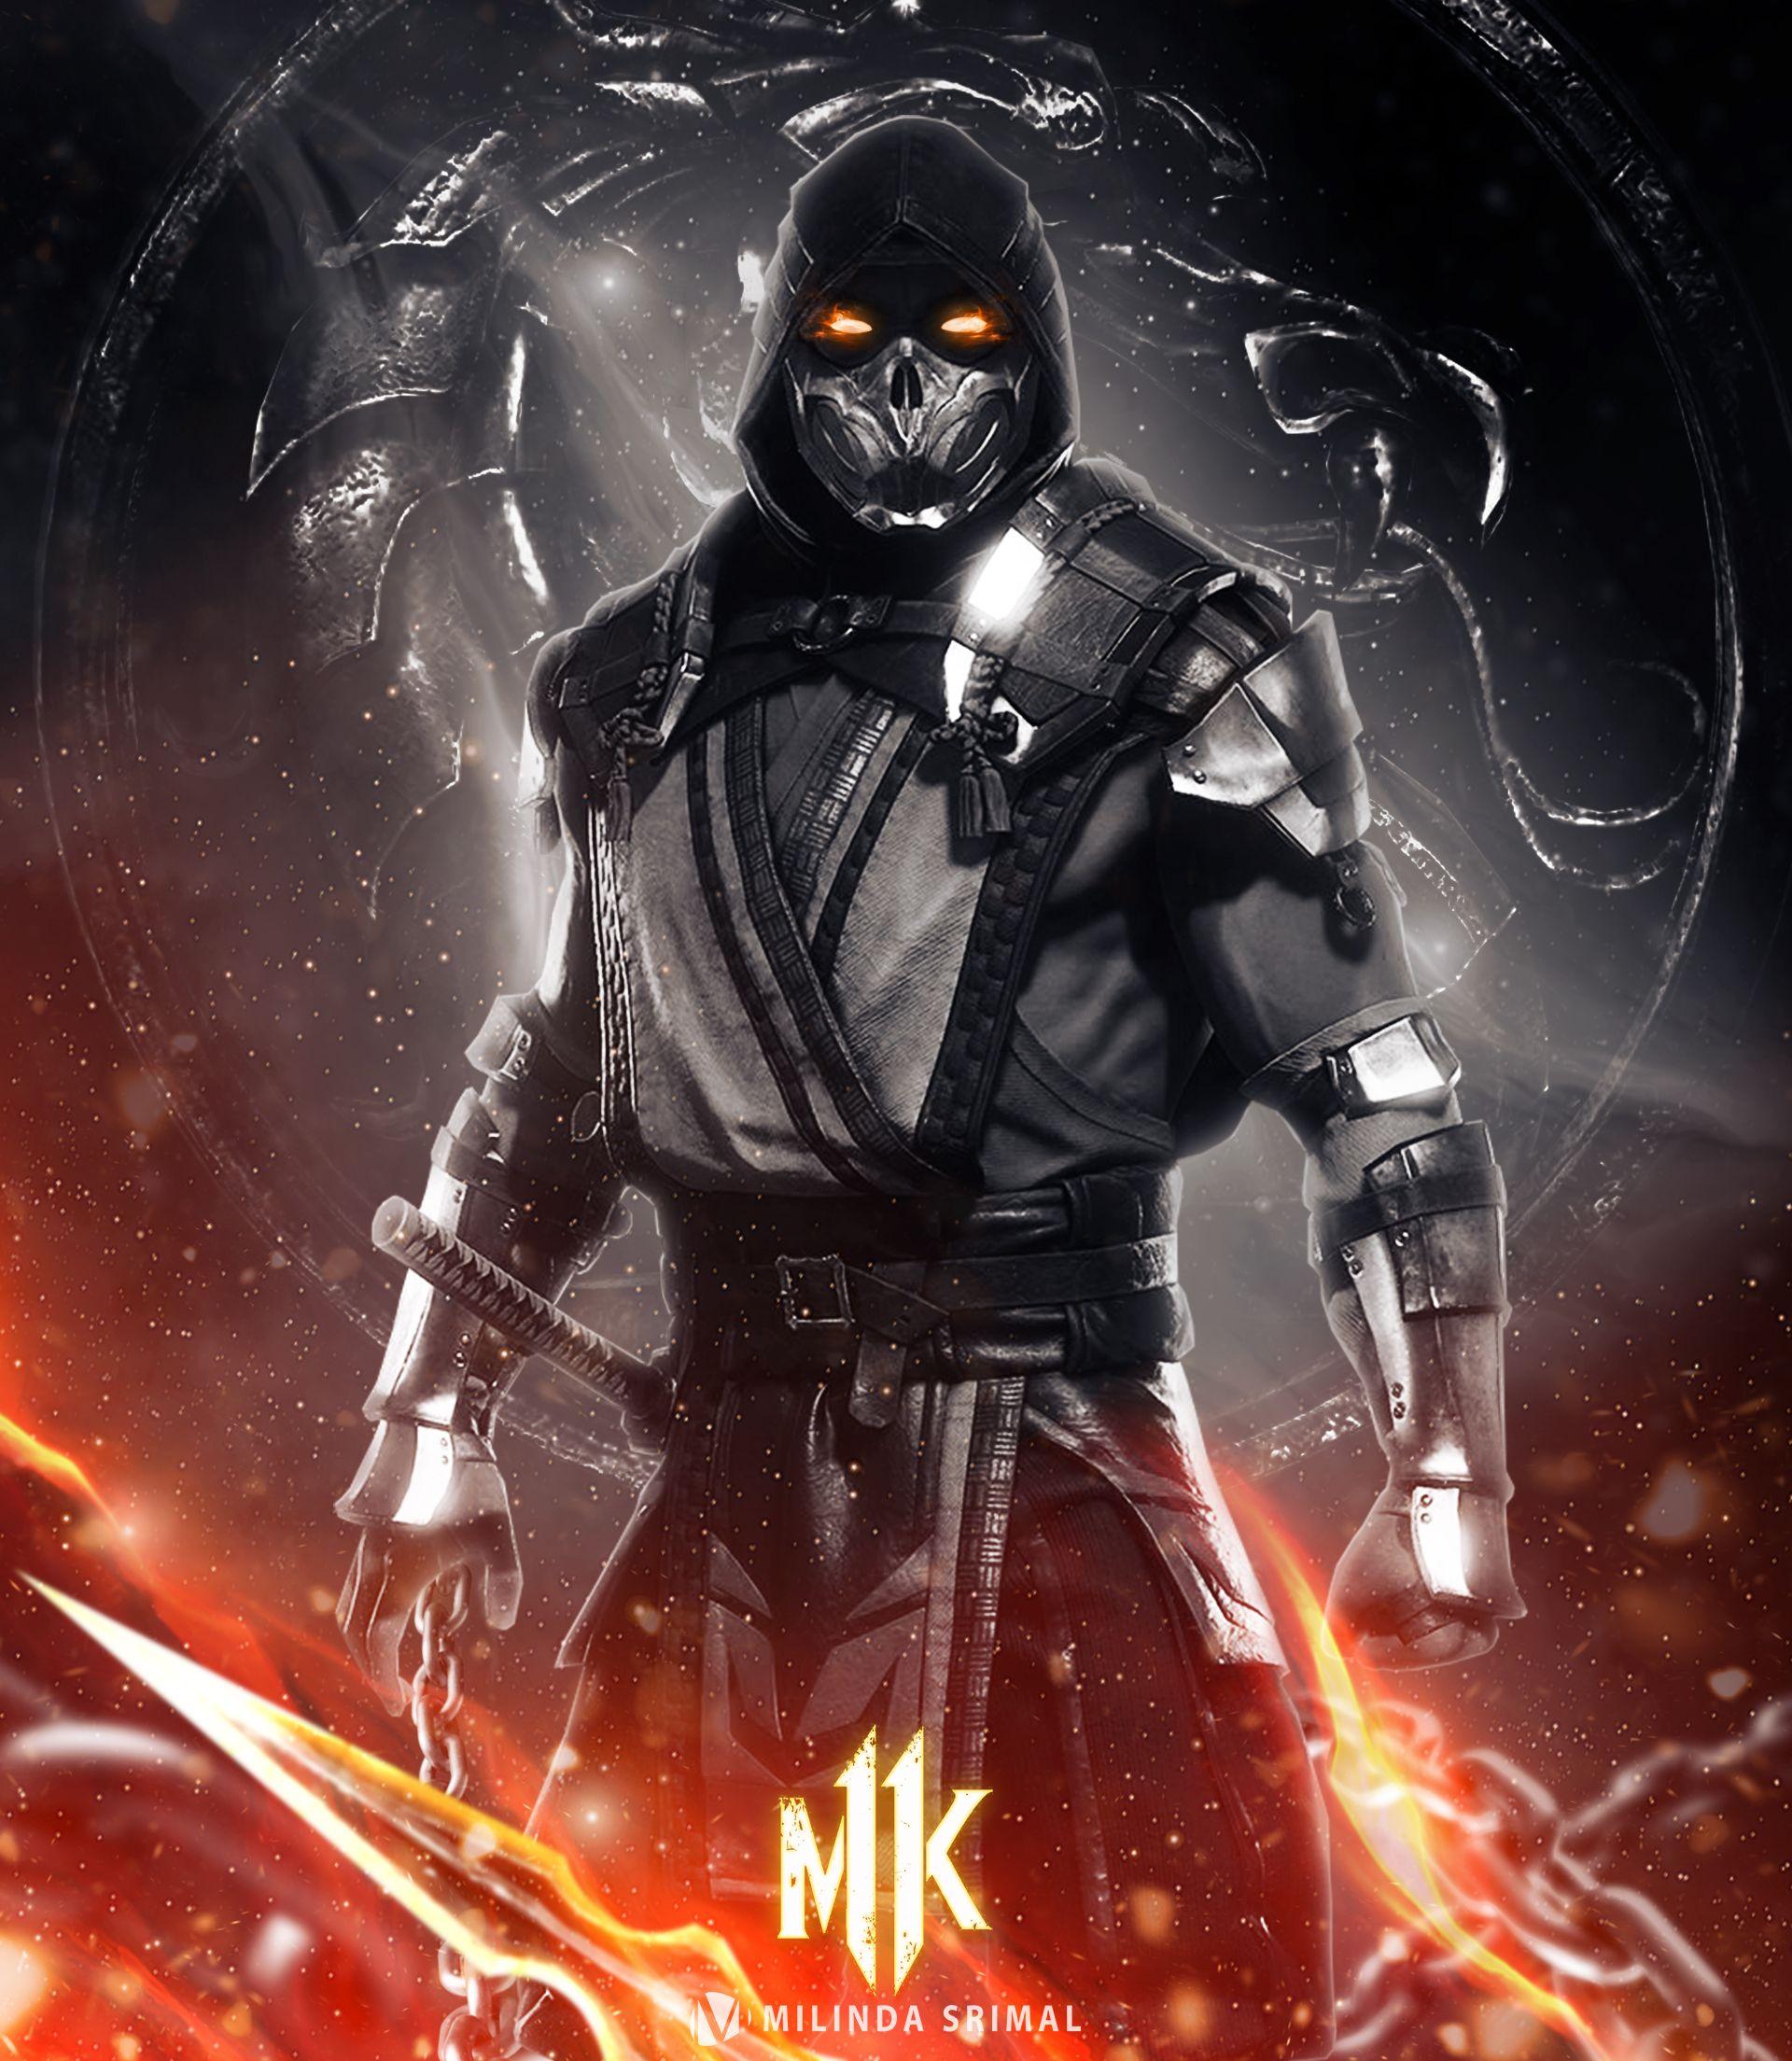 Mortal kombat movie scorpion mortal kombat movie poster